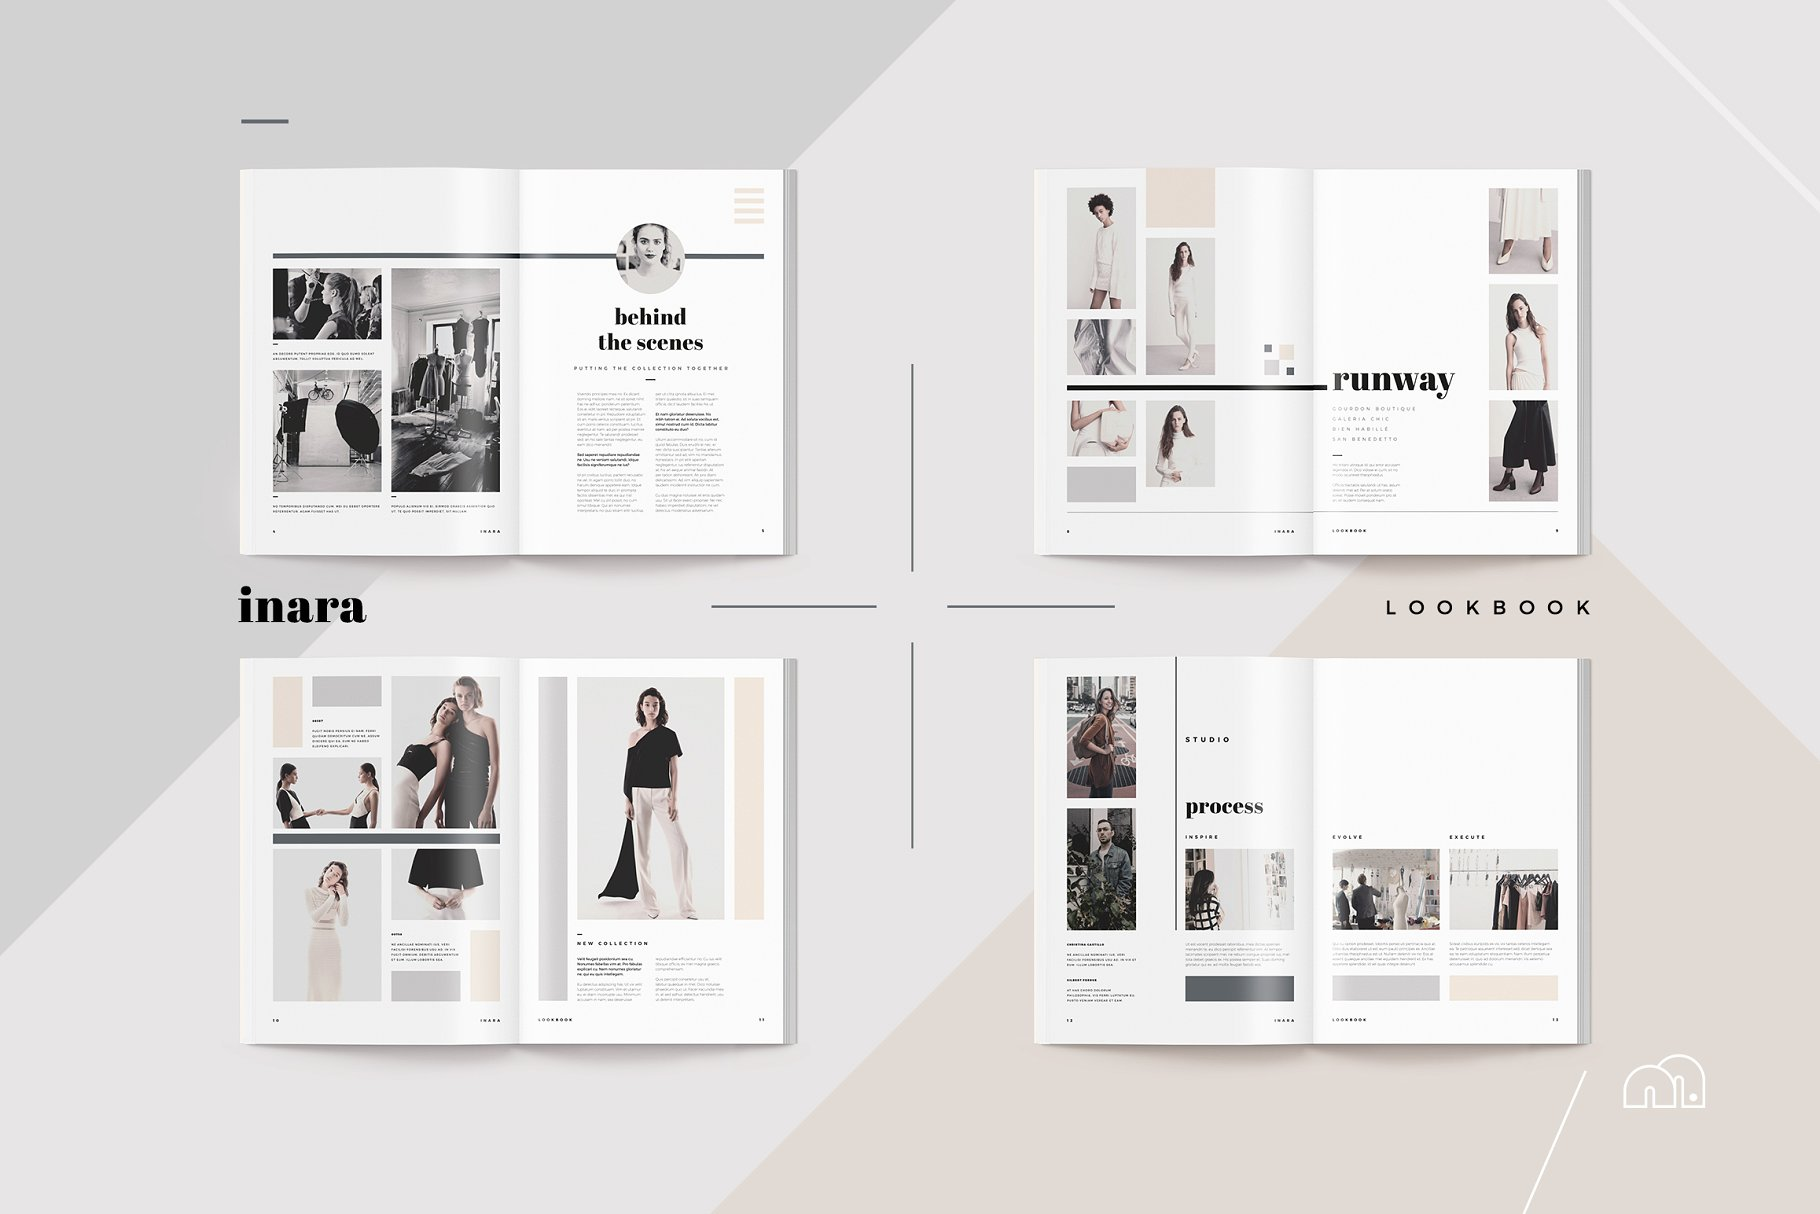 lookbook-inara-preview-6-.jpg